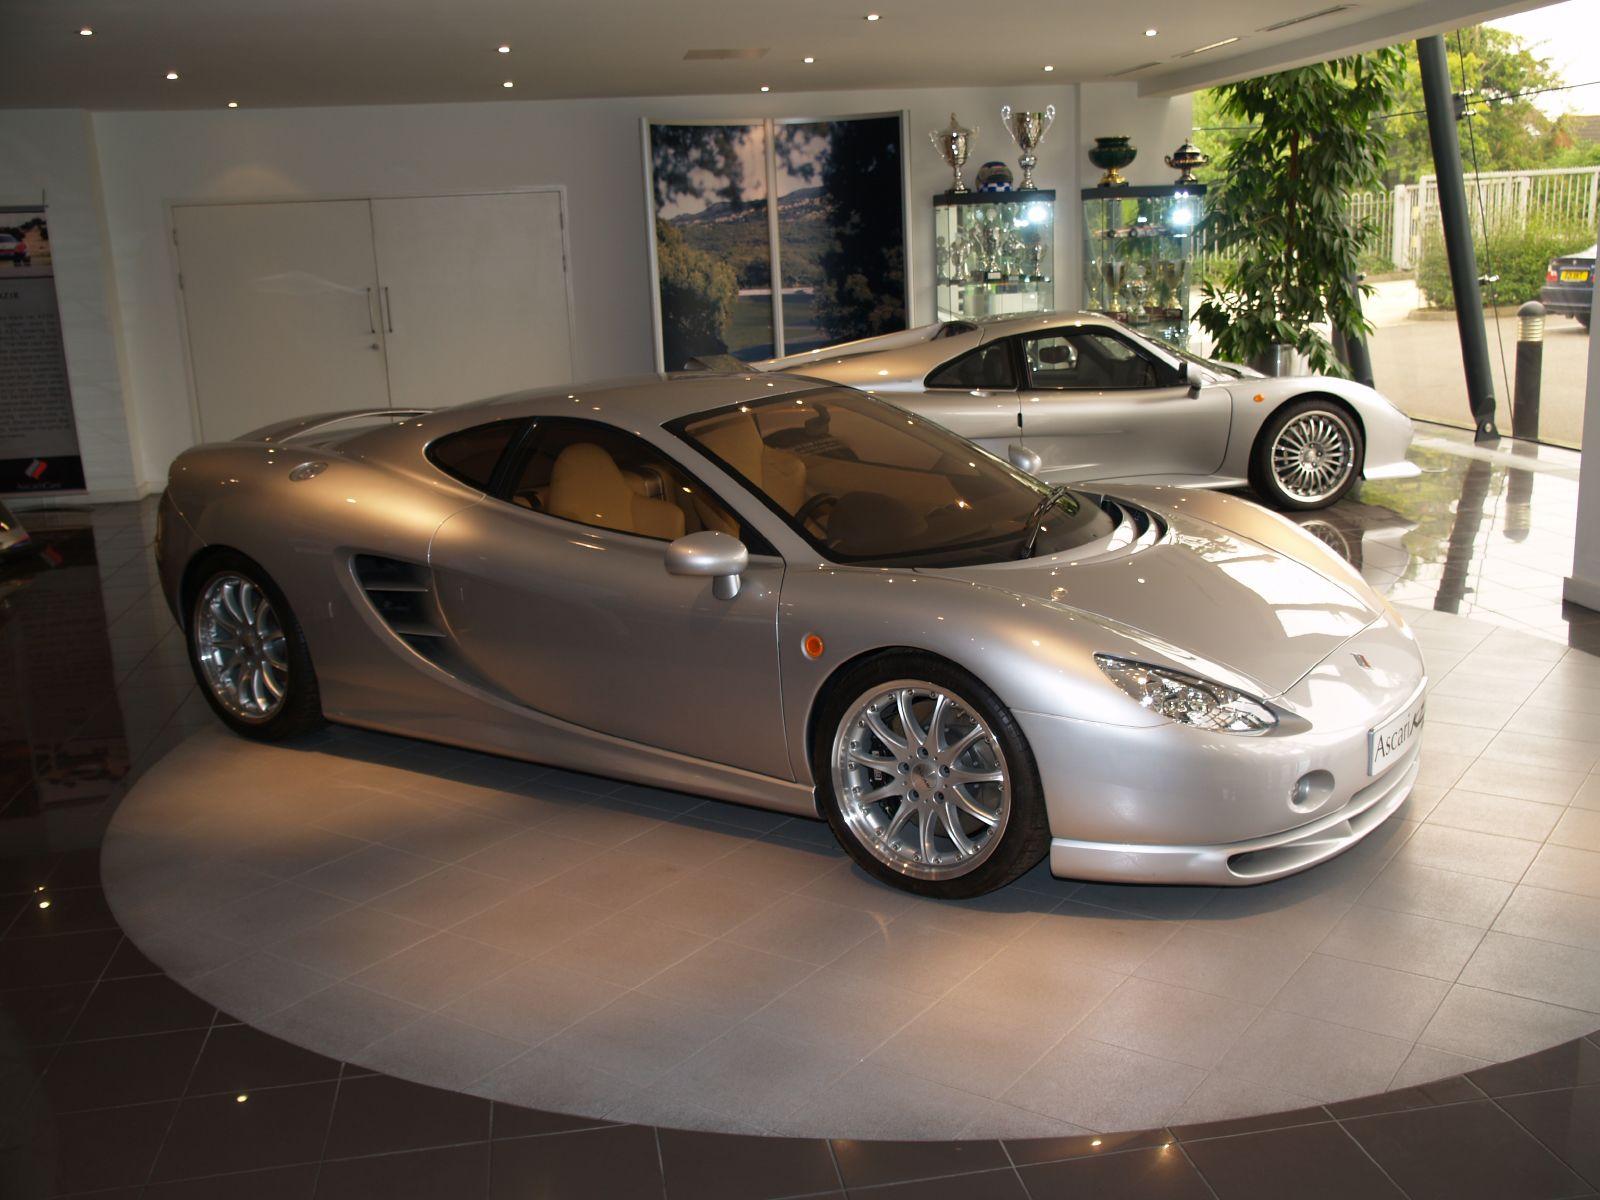 ascari_kz1_cars+%25284%2529.jpg